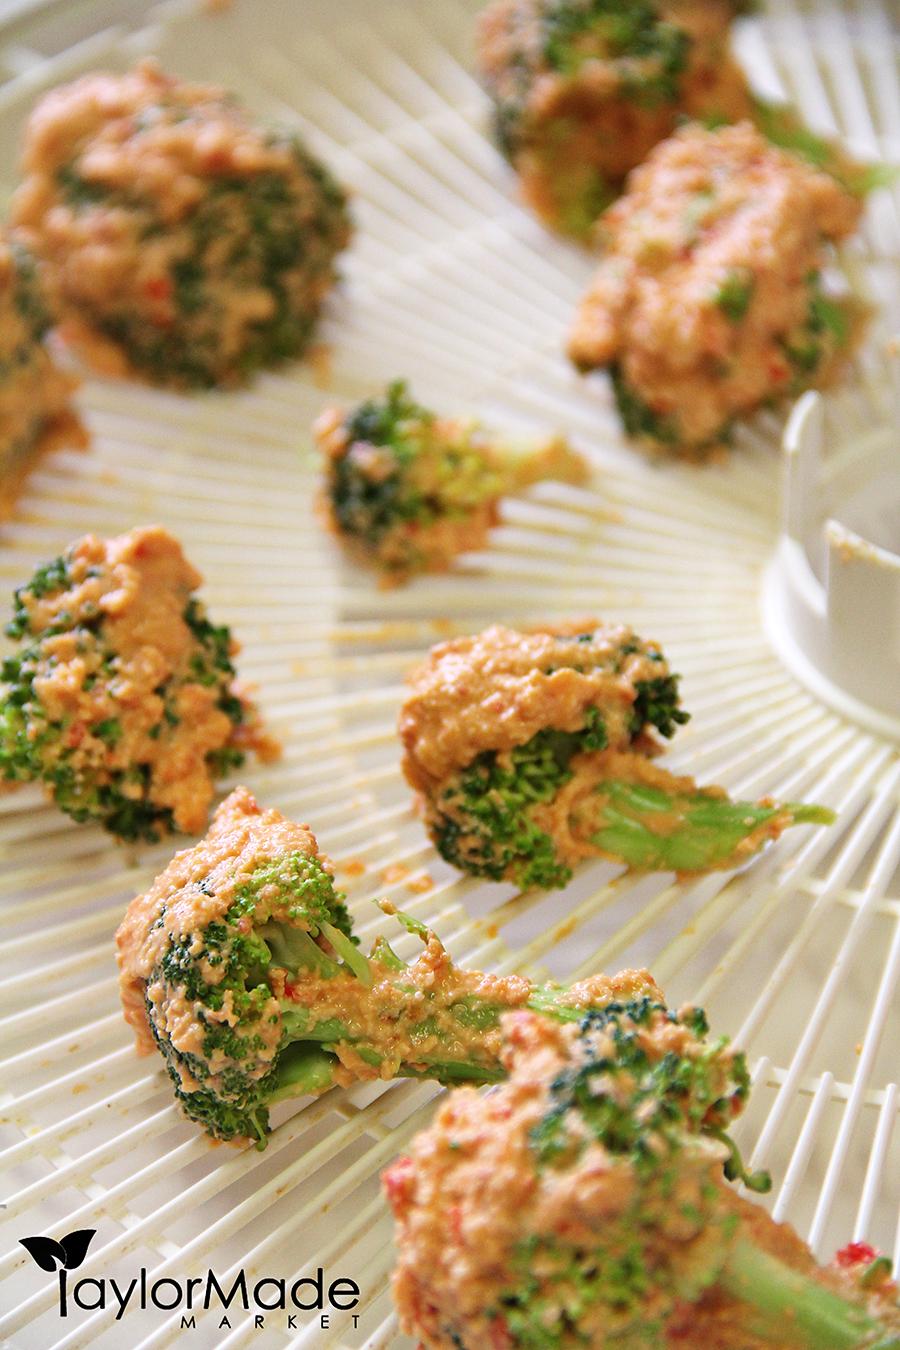 broccoli with cheese on dehydrator